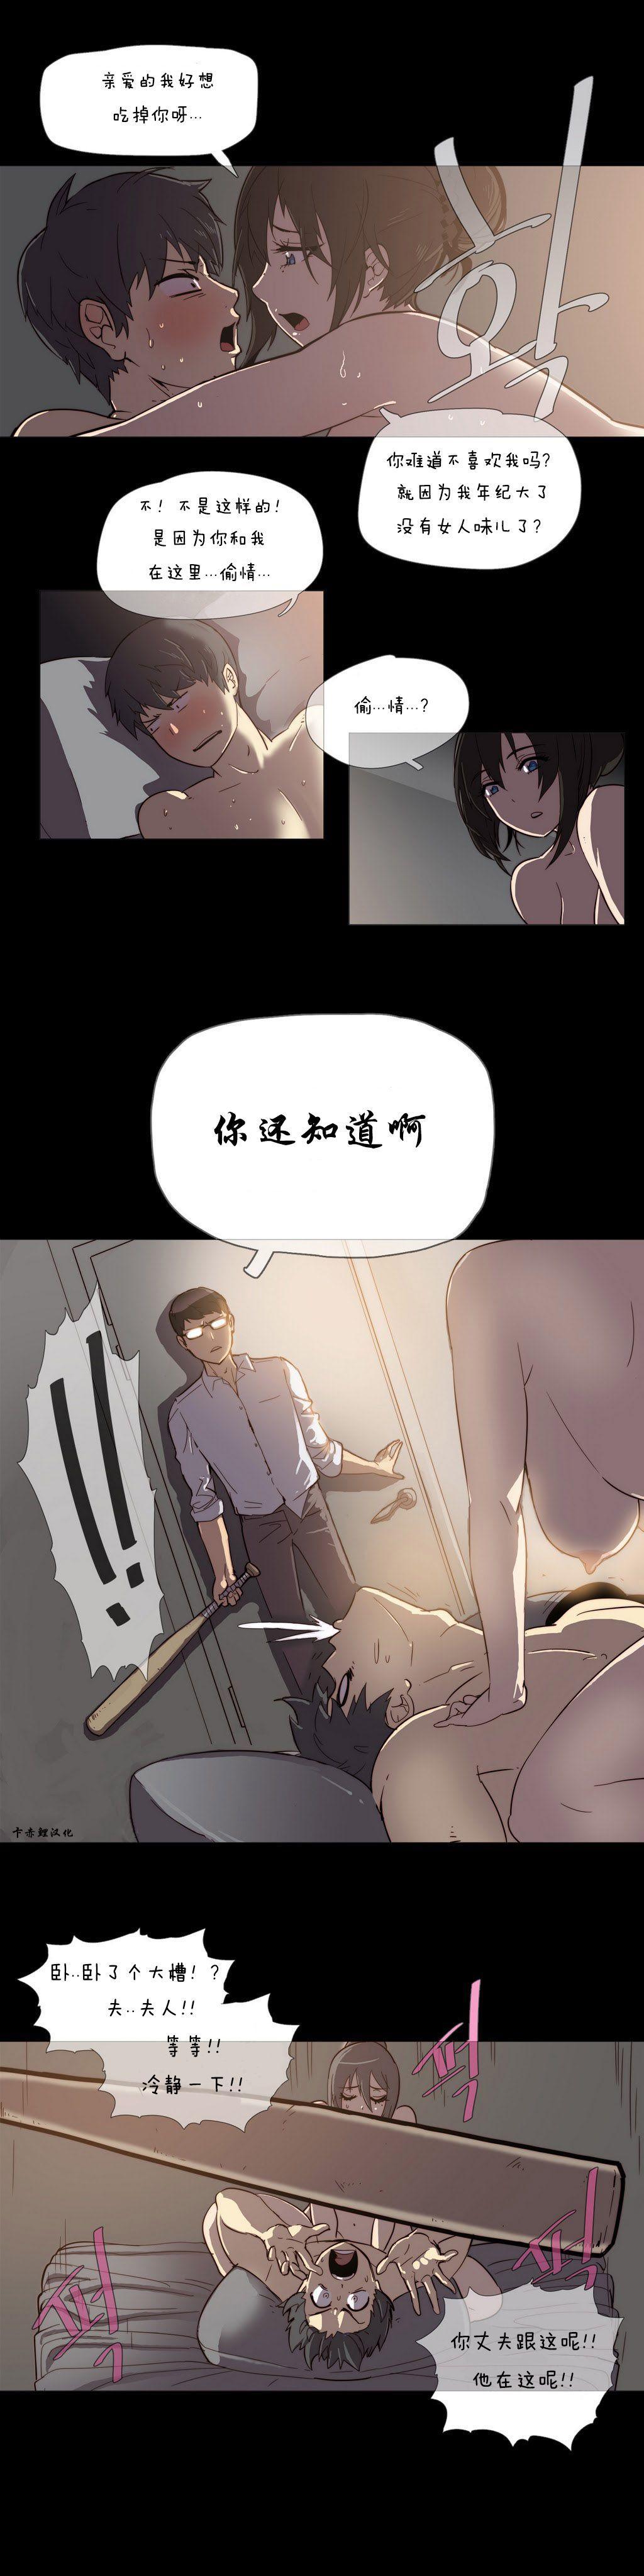 HouseHold Affairs 【卞赤鲤个人汉化】1~33话(持续更新中) 18